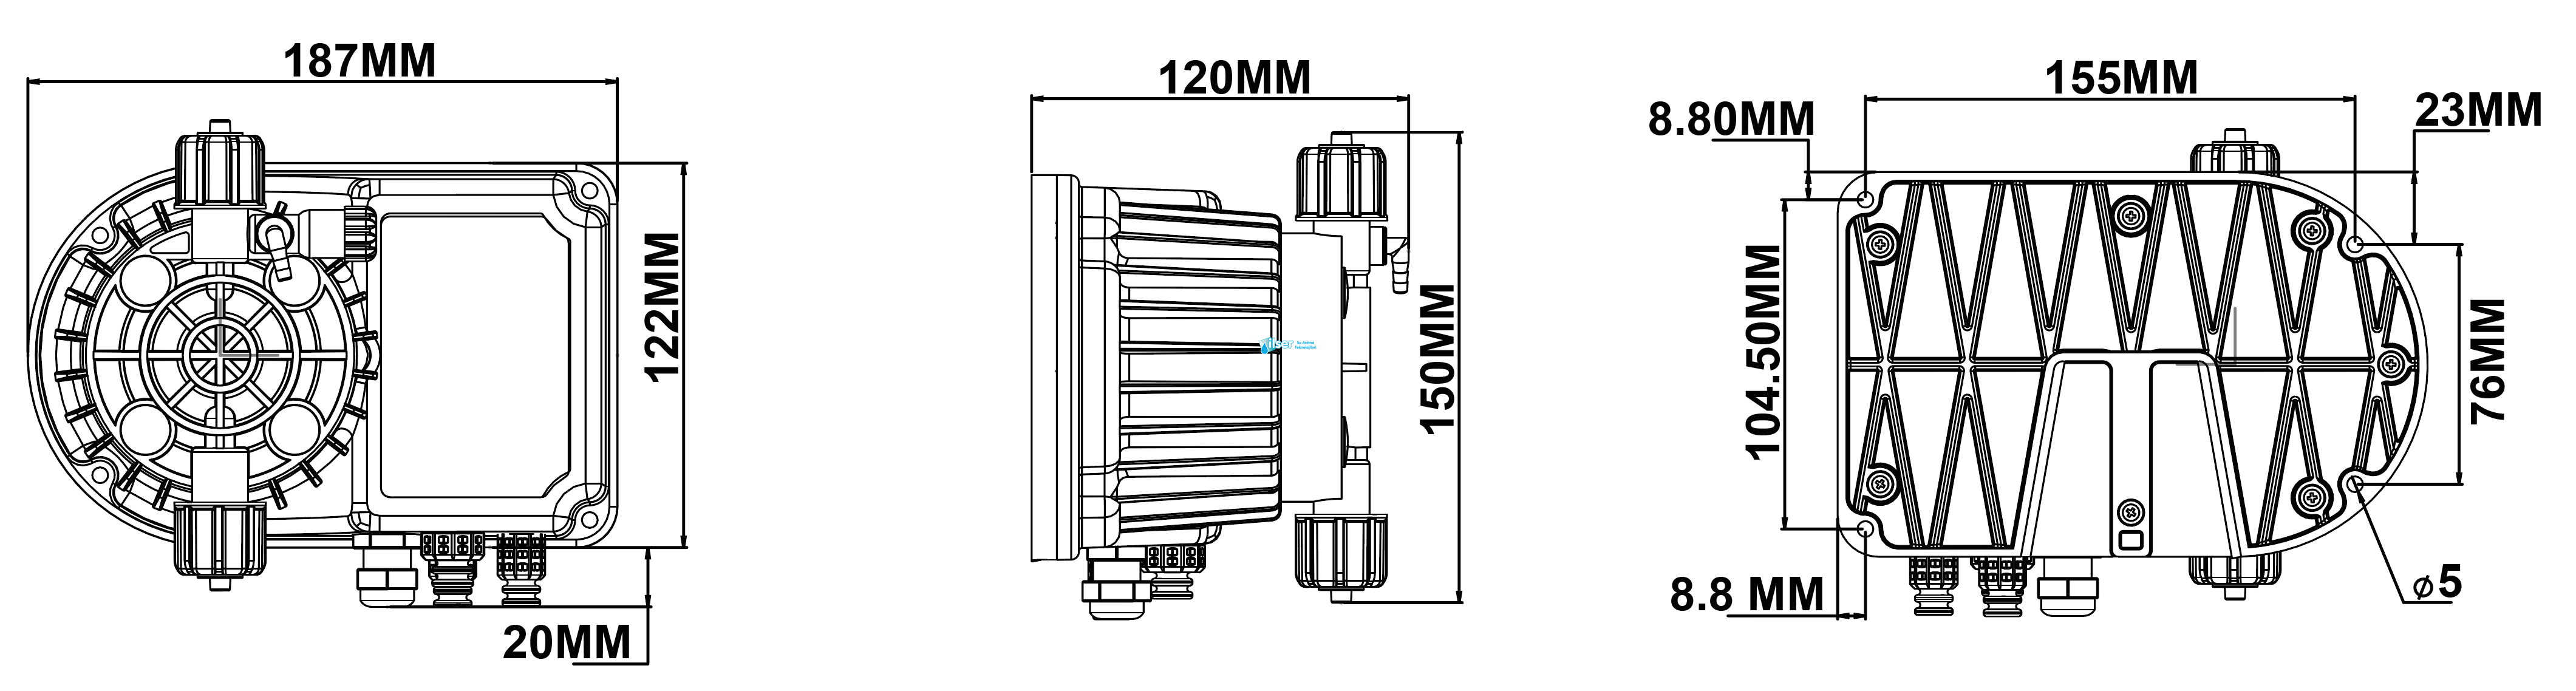 Antech DP LARA A 5L/7B V220FAT Dozaj Pompası